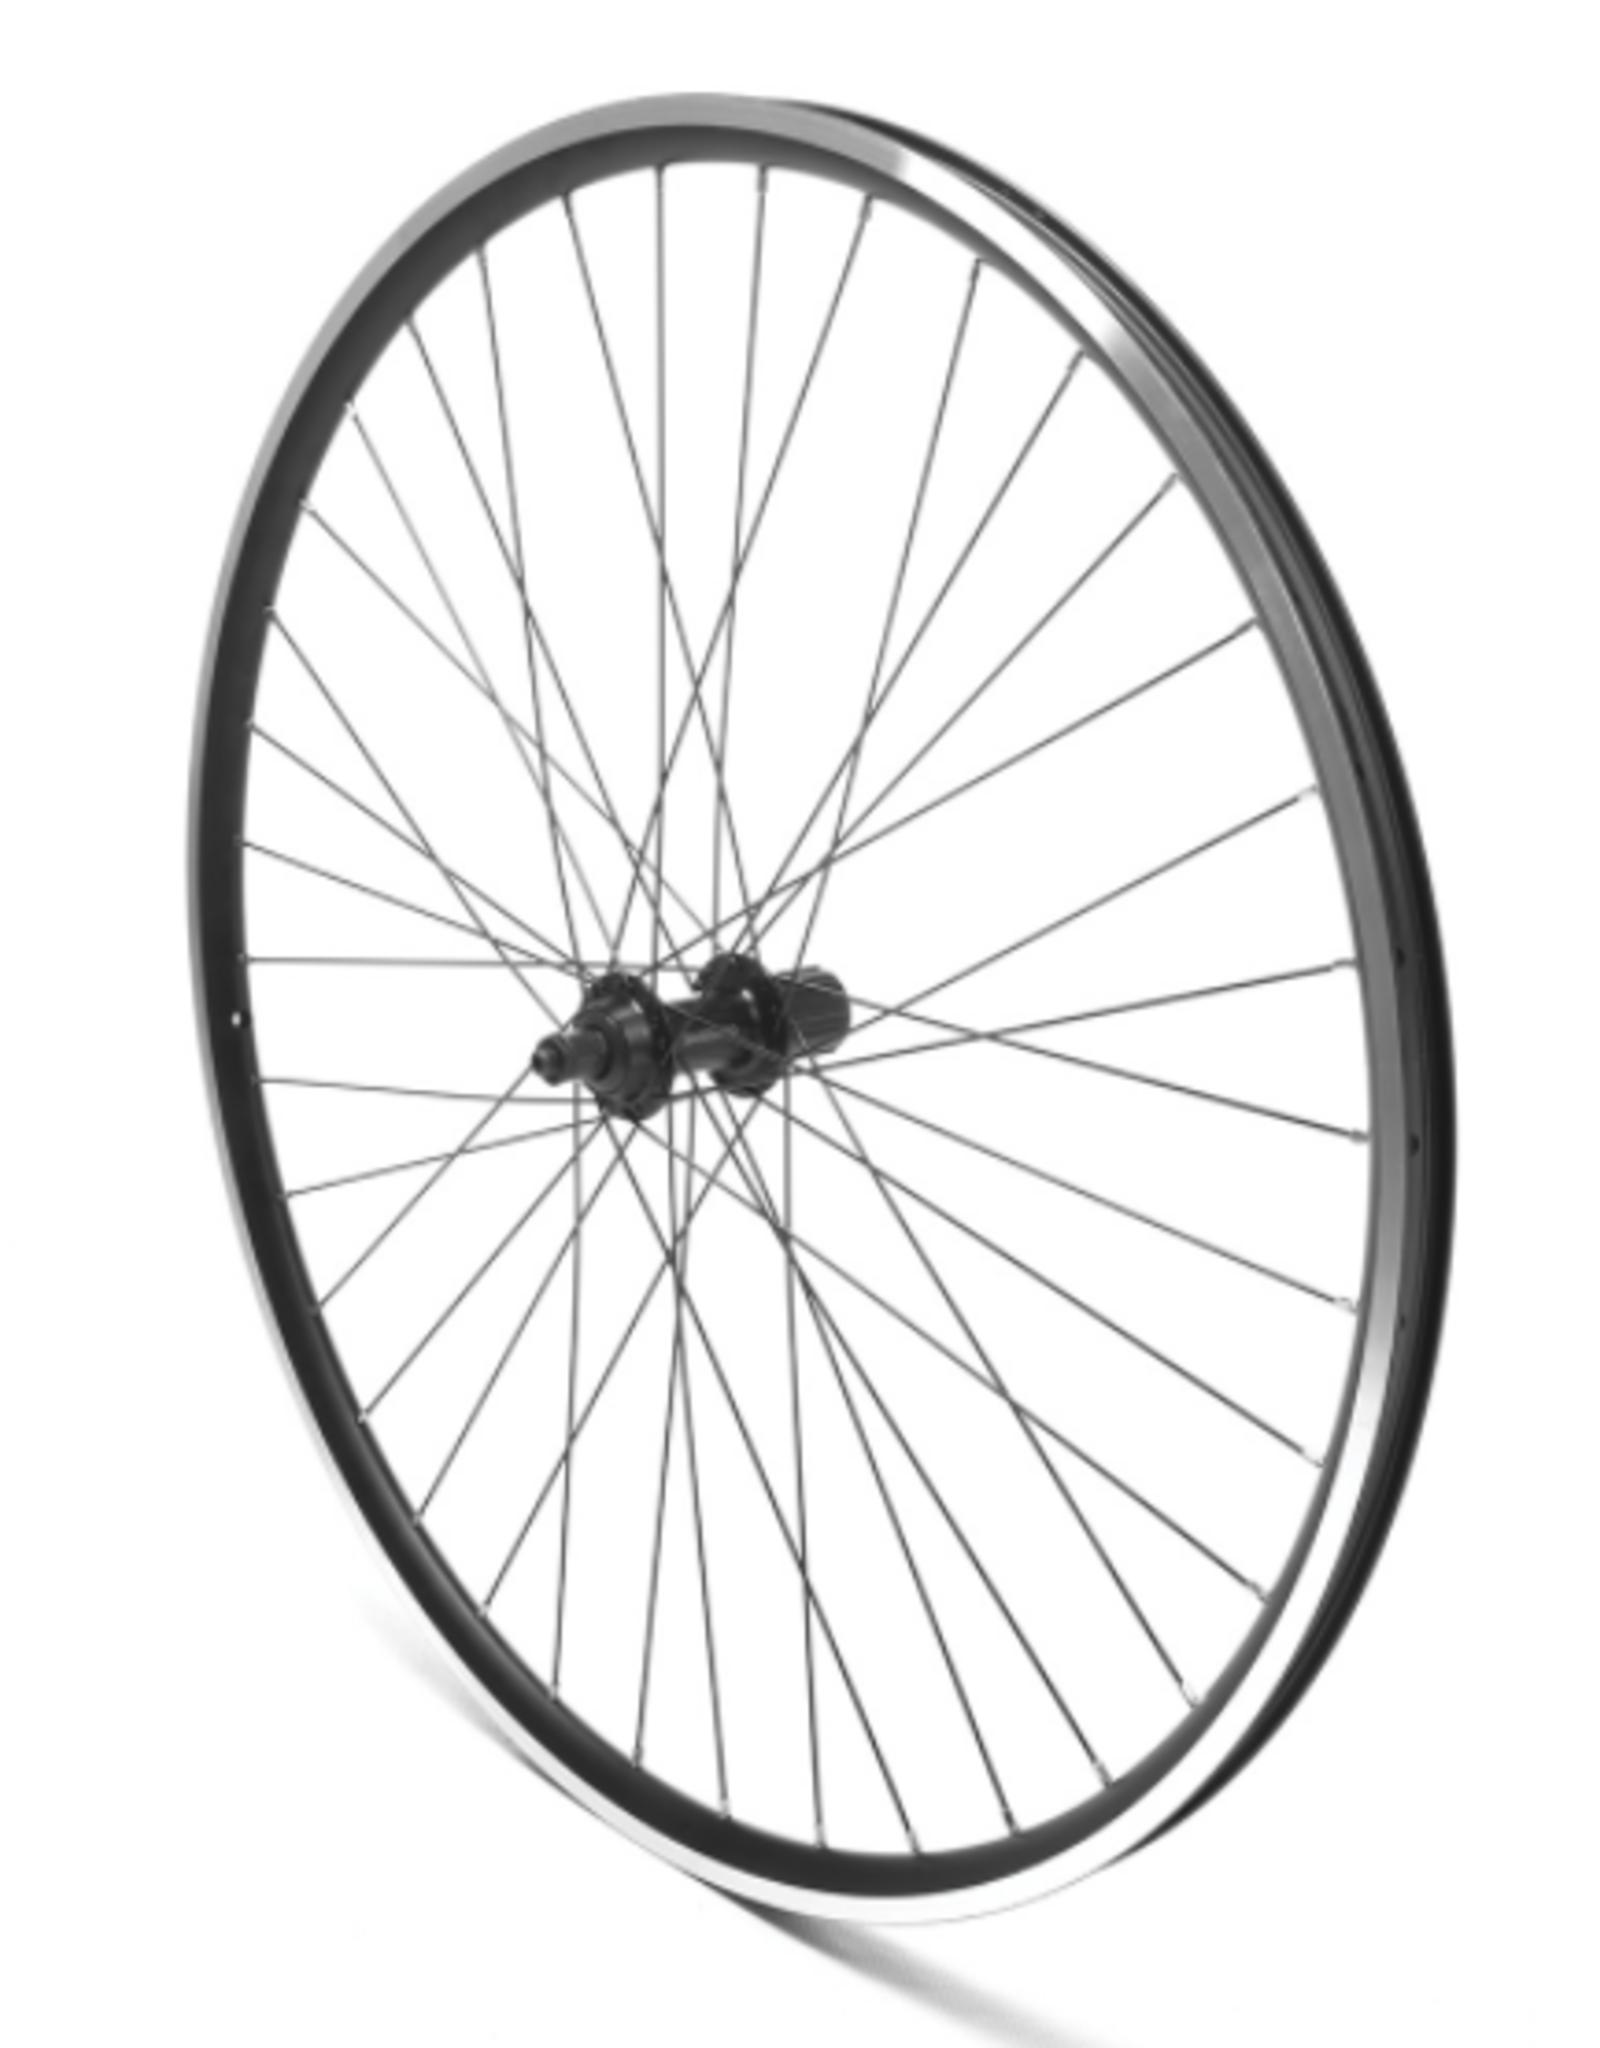 Oxford Oxford Rear Wheel 700c Hybrid, Cassette, Black, QR